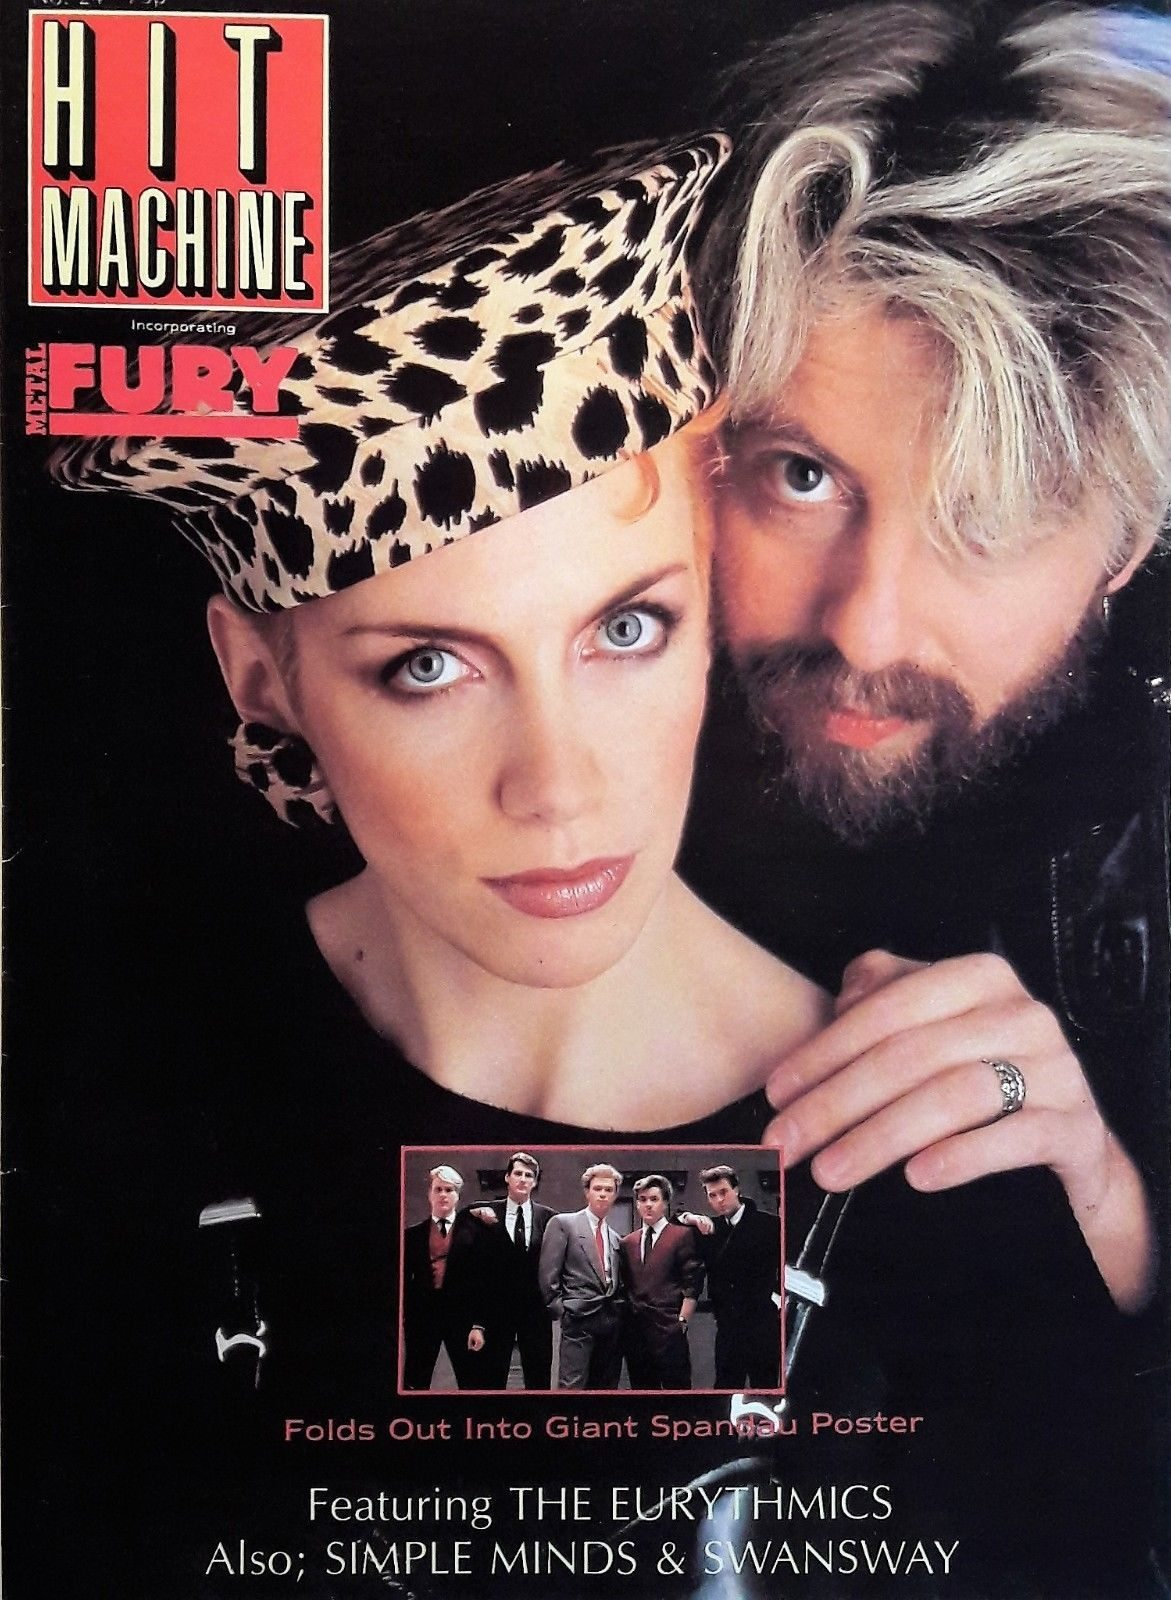 Ultimate Eurythmics Archives : Eurythmics - Hit Machine Magazine - 31/12/1984